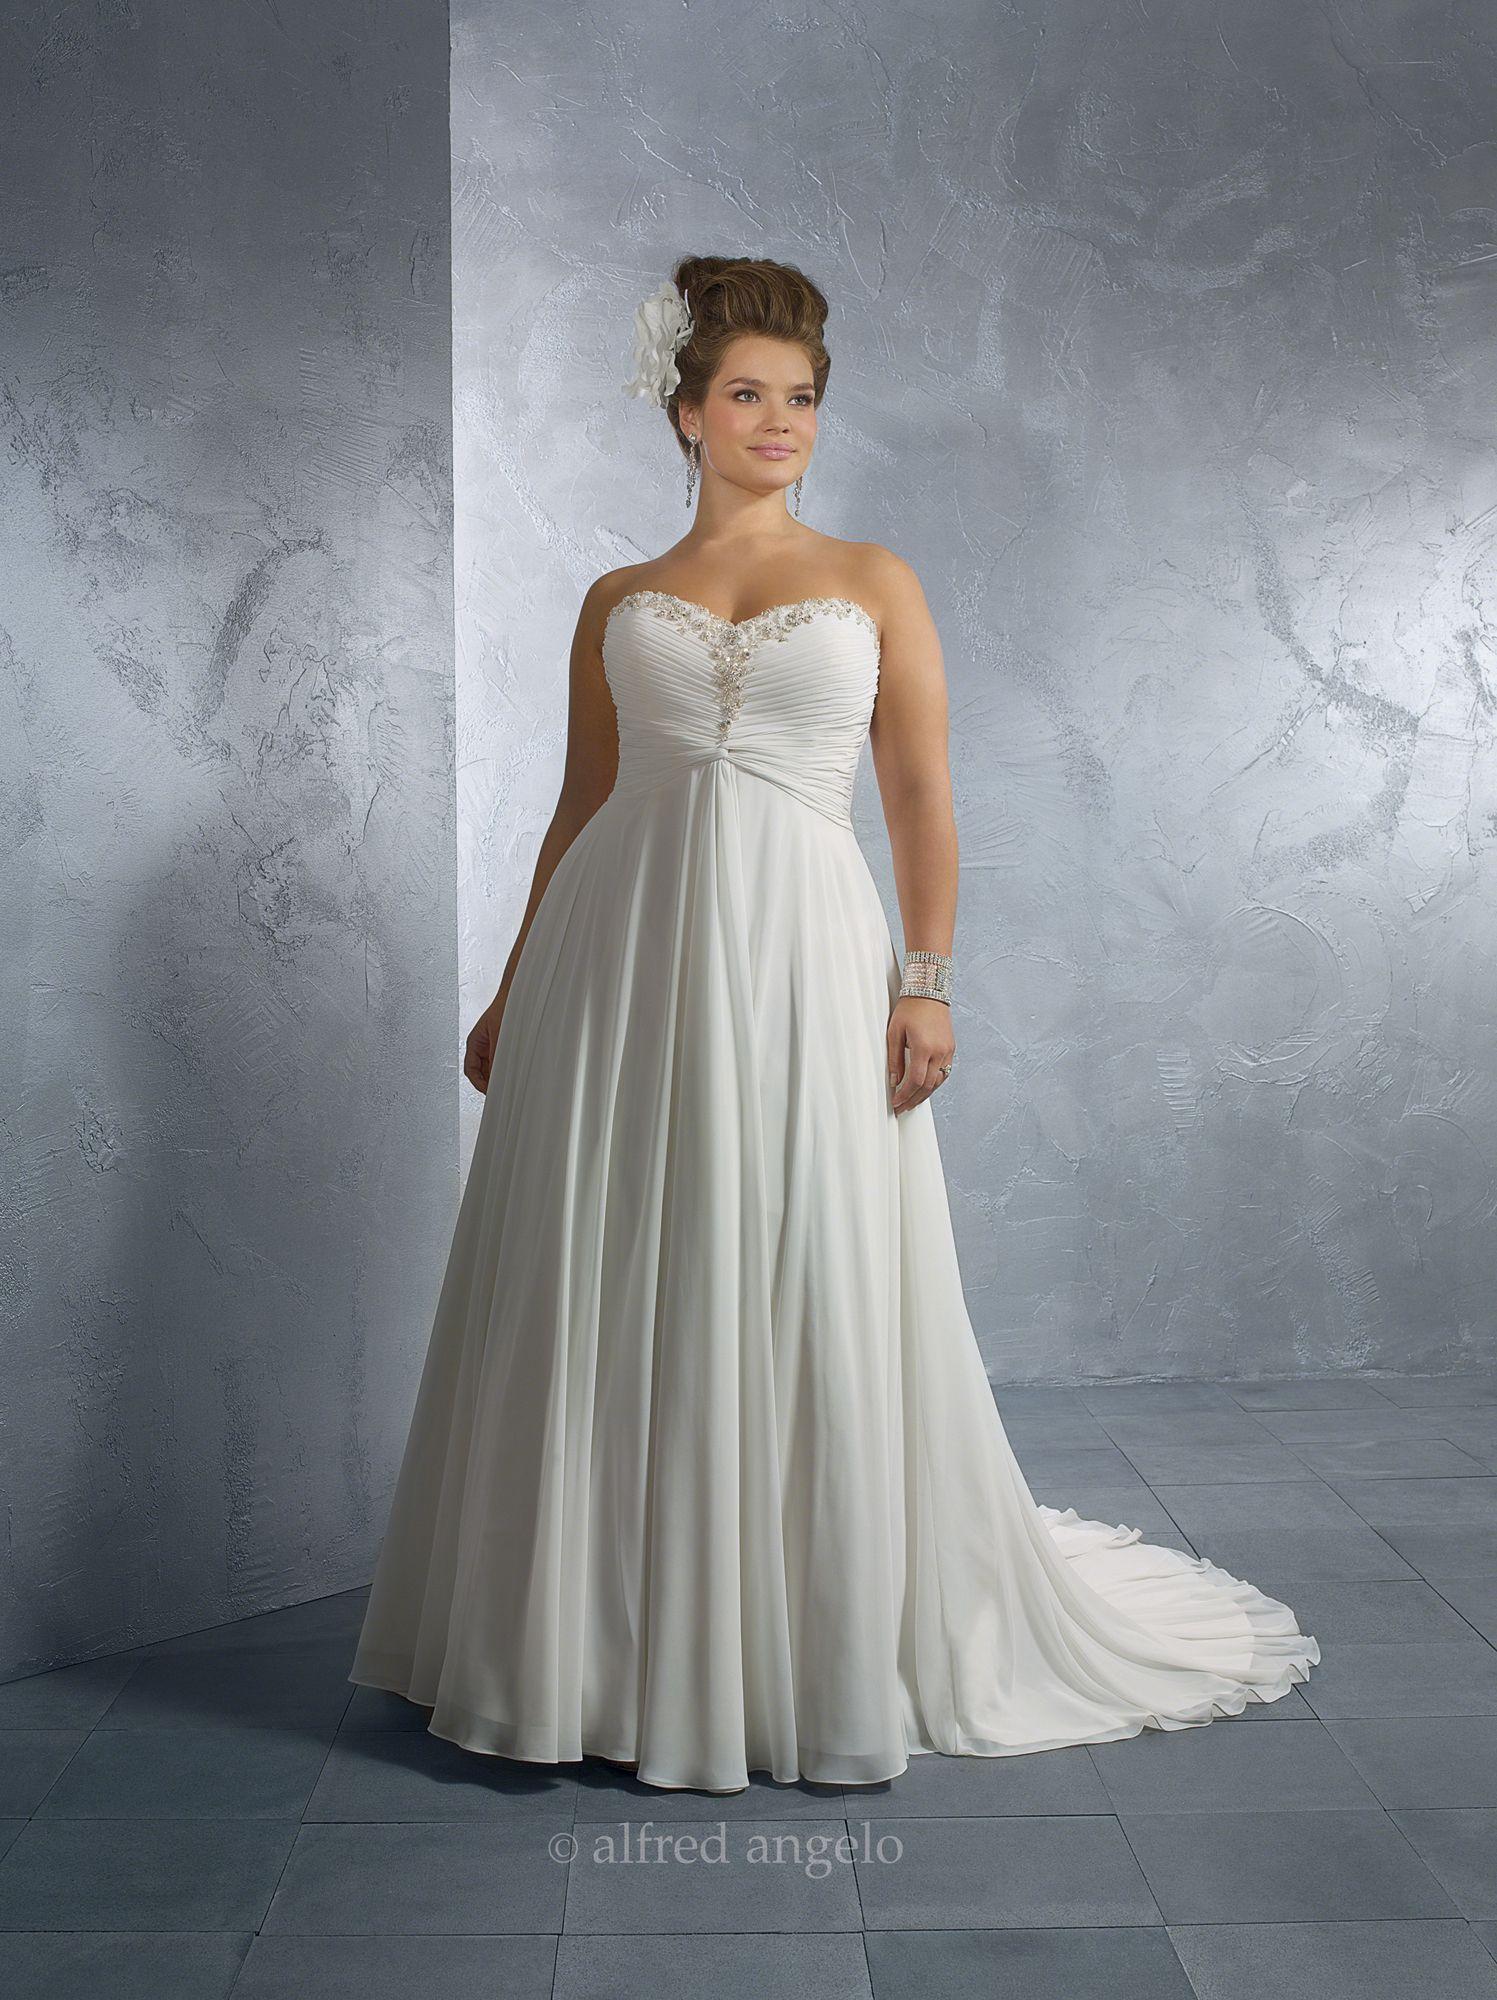 Pin de Rebeka Mendoza en la boda | Pinterest | Vestidos de novia ...